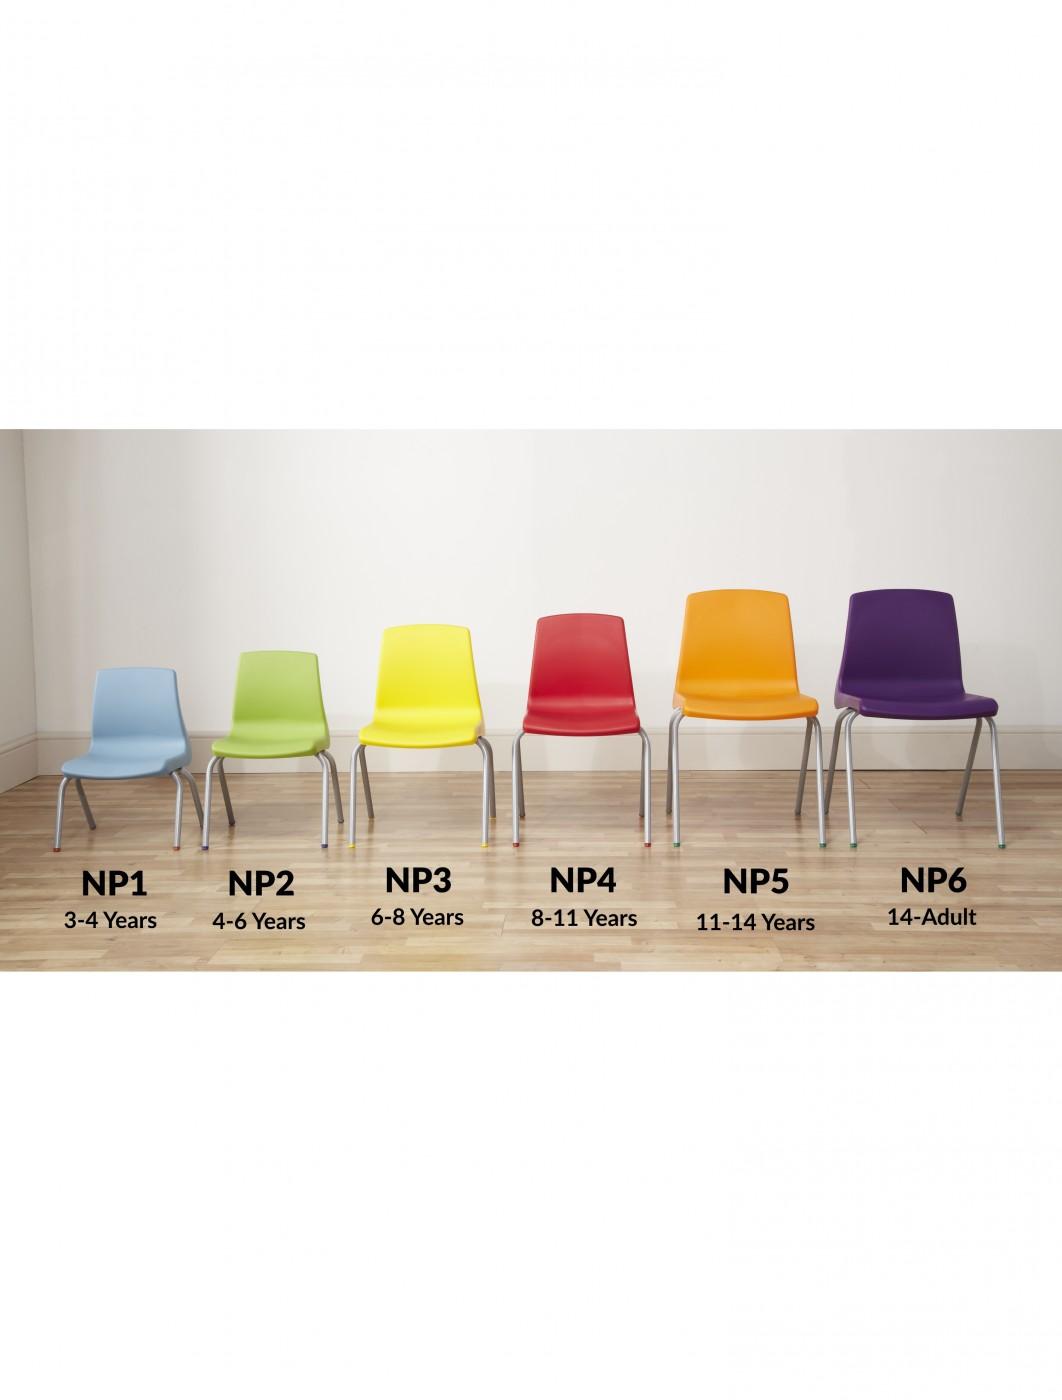 Metalliform NP2 Stacking Classroom Chair | 121 Office Furniture